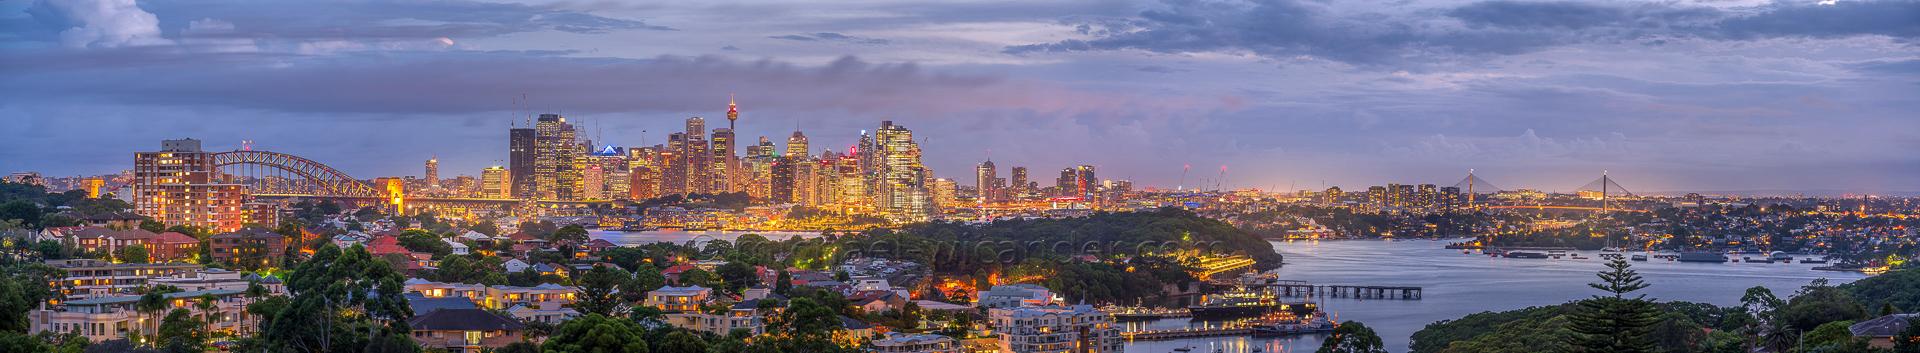 Sydney Skyline Panorama 19 05